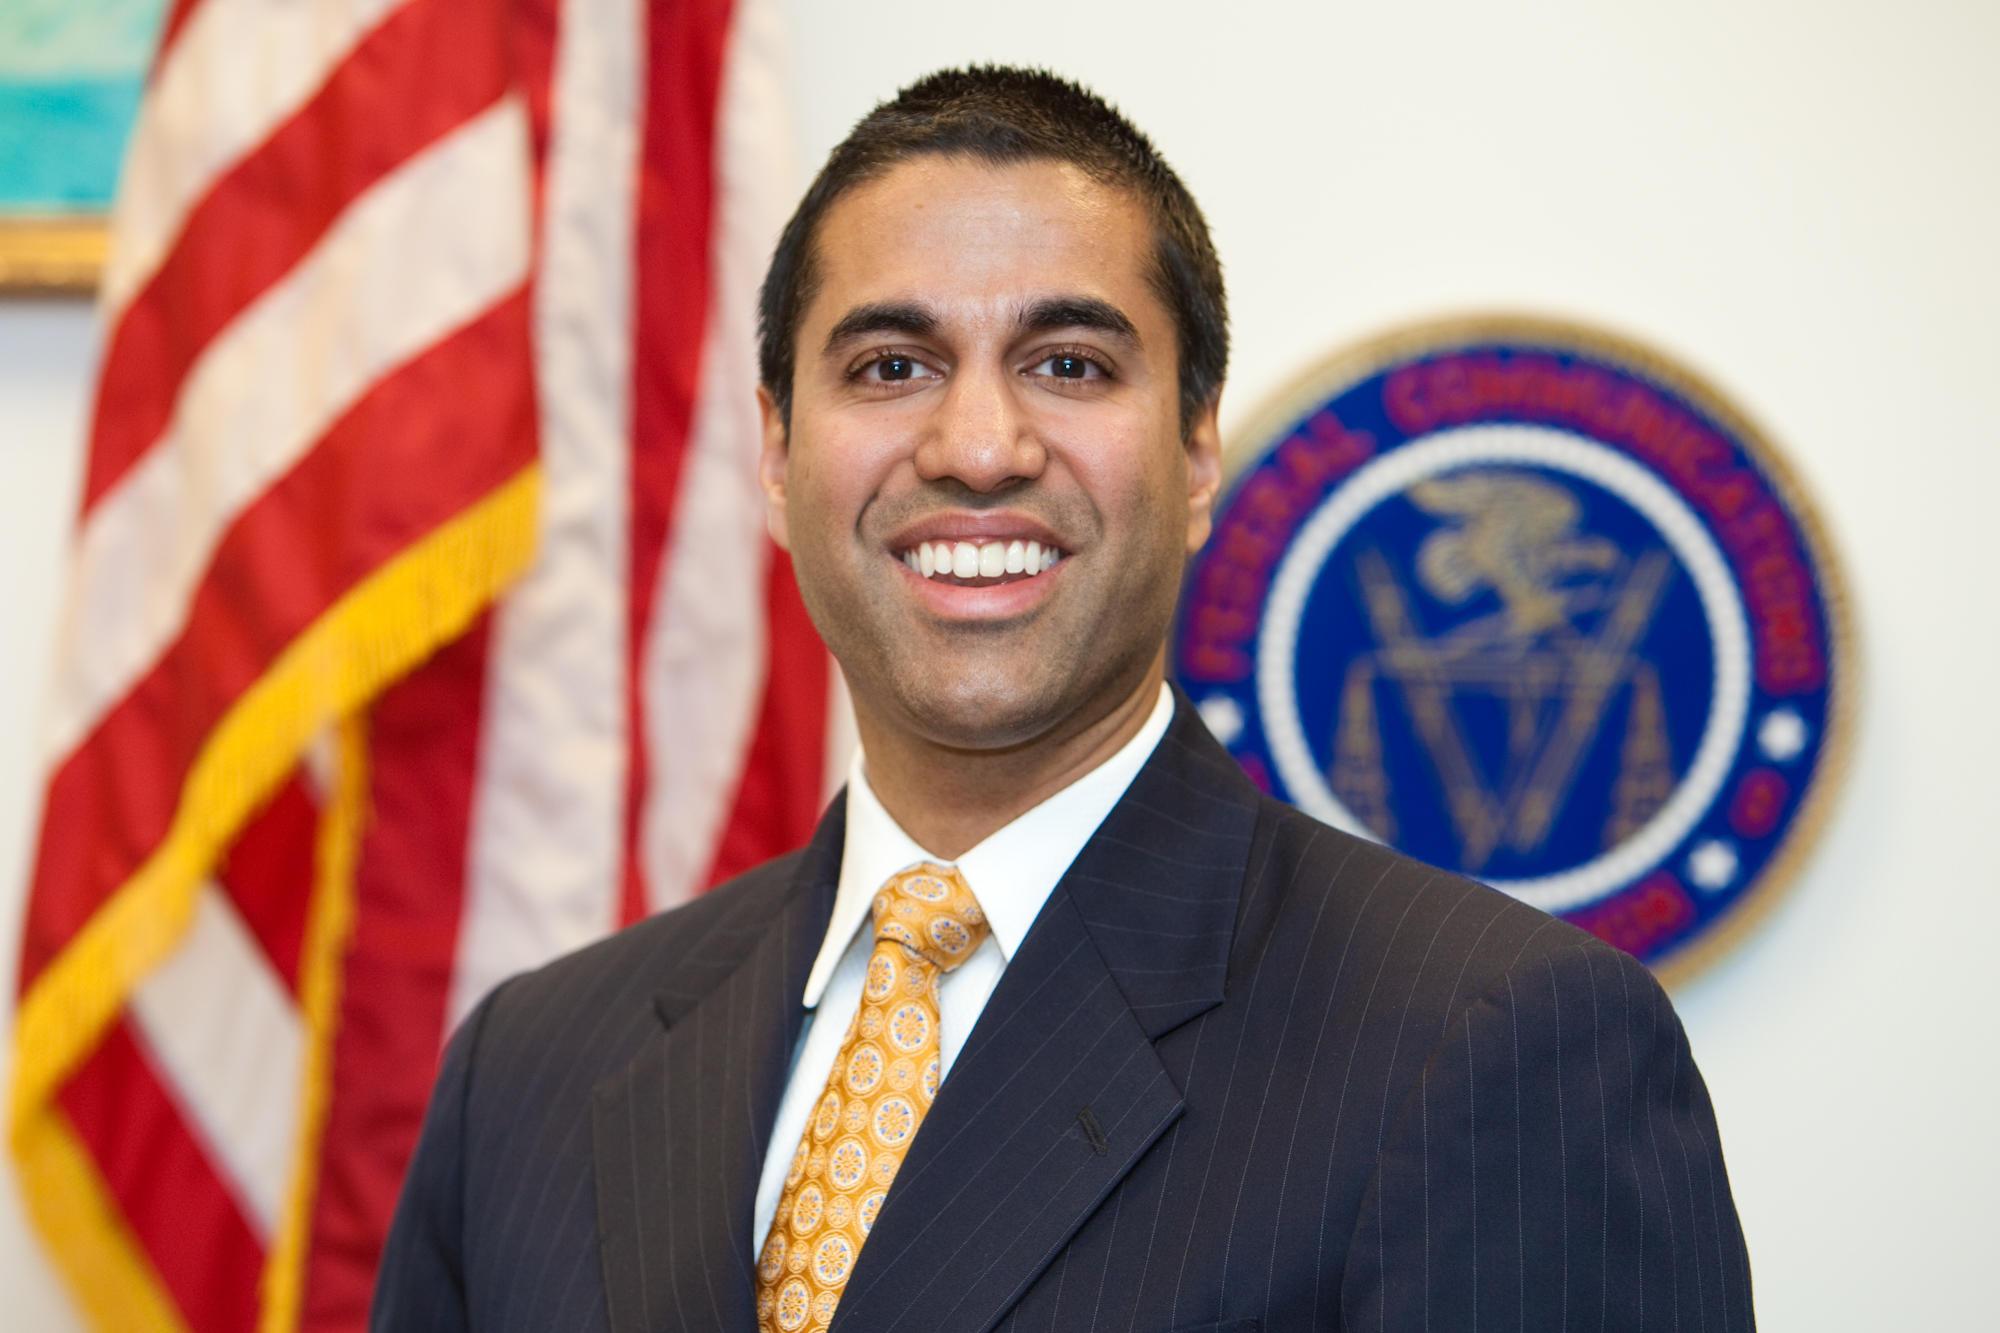 Net neutrality Ajit Pai Chairman FCC